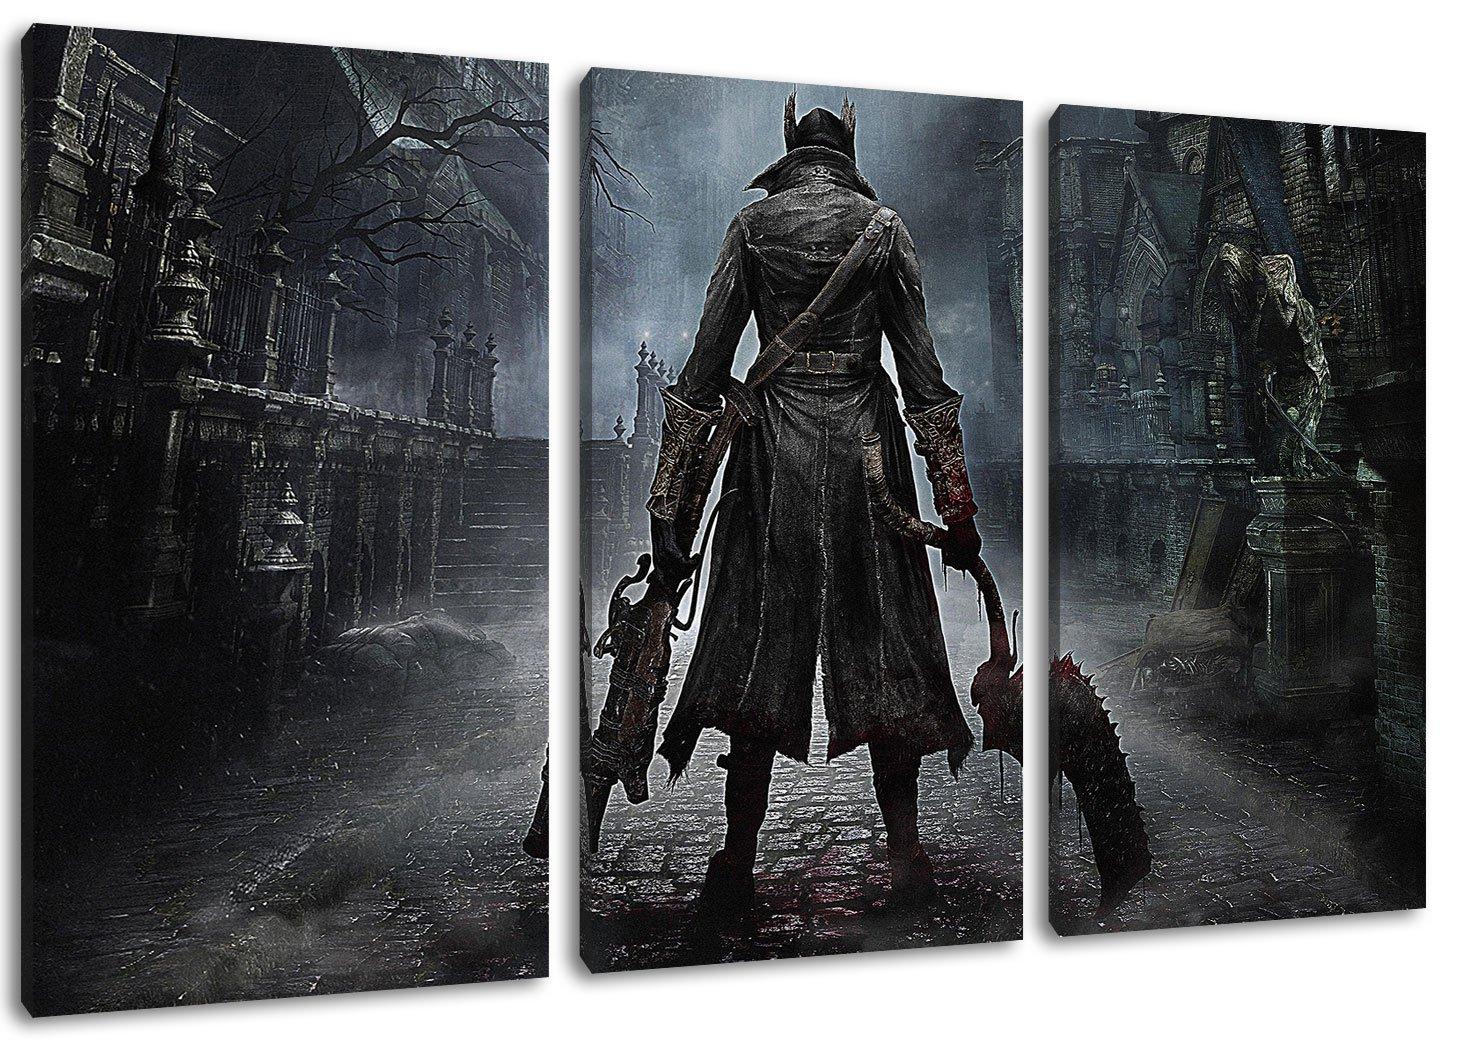 Amazon.de: bloodborne ps4 game 3-Teilig(120x80cm) auf Leinwand, XXL ...